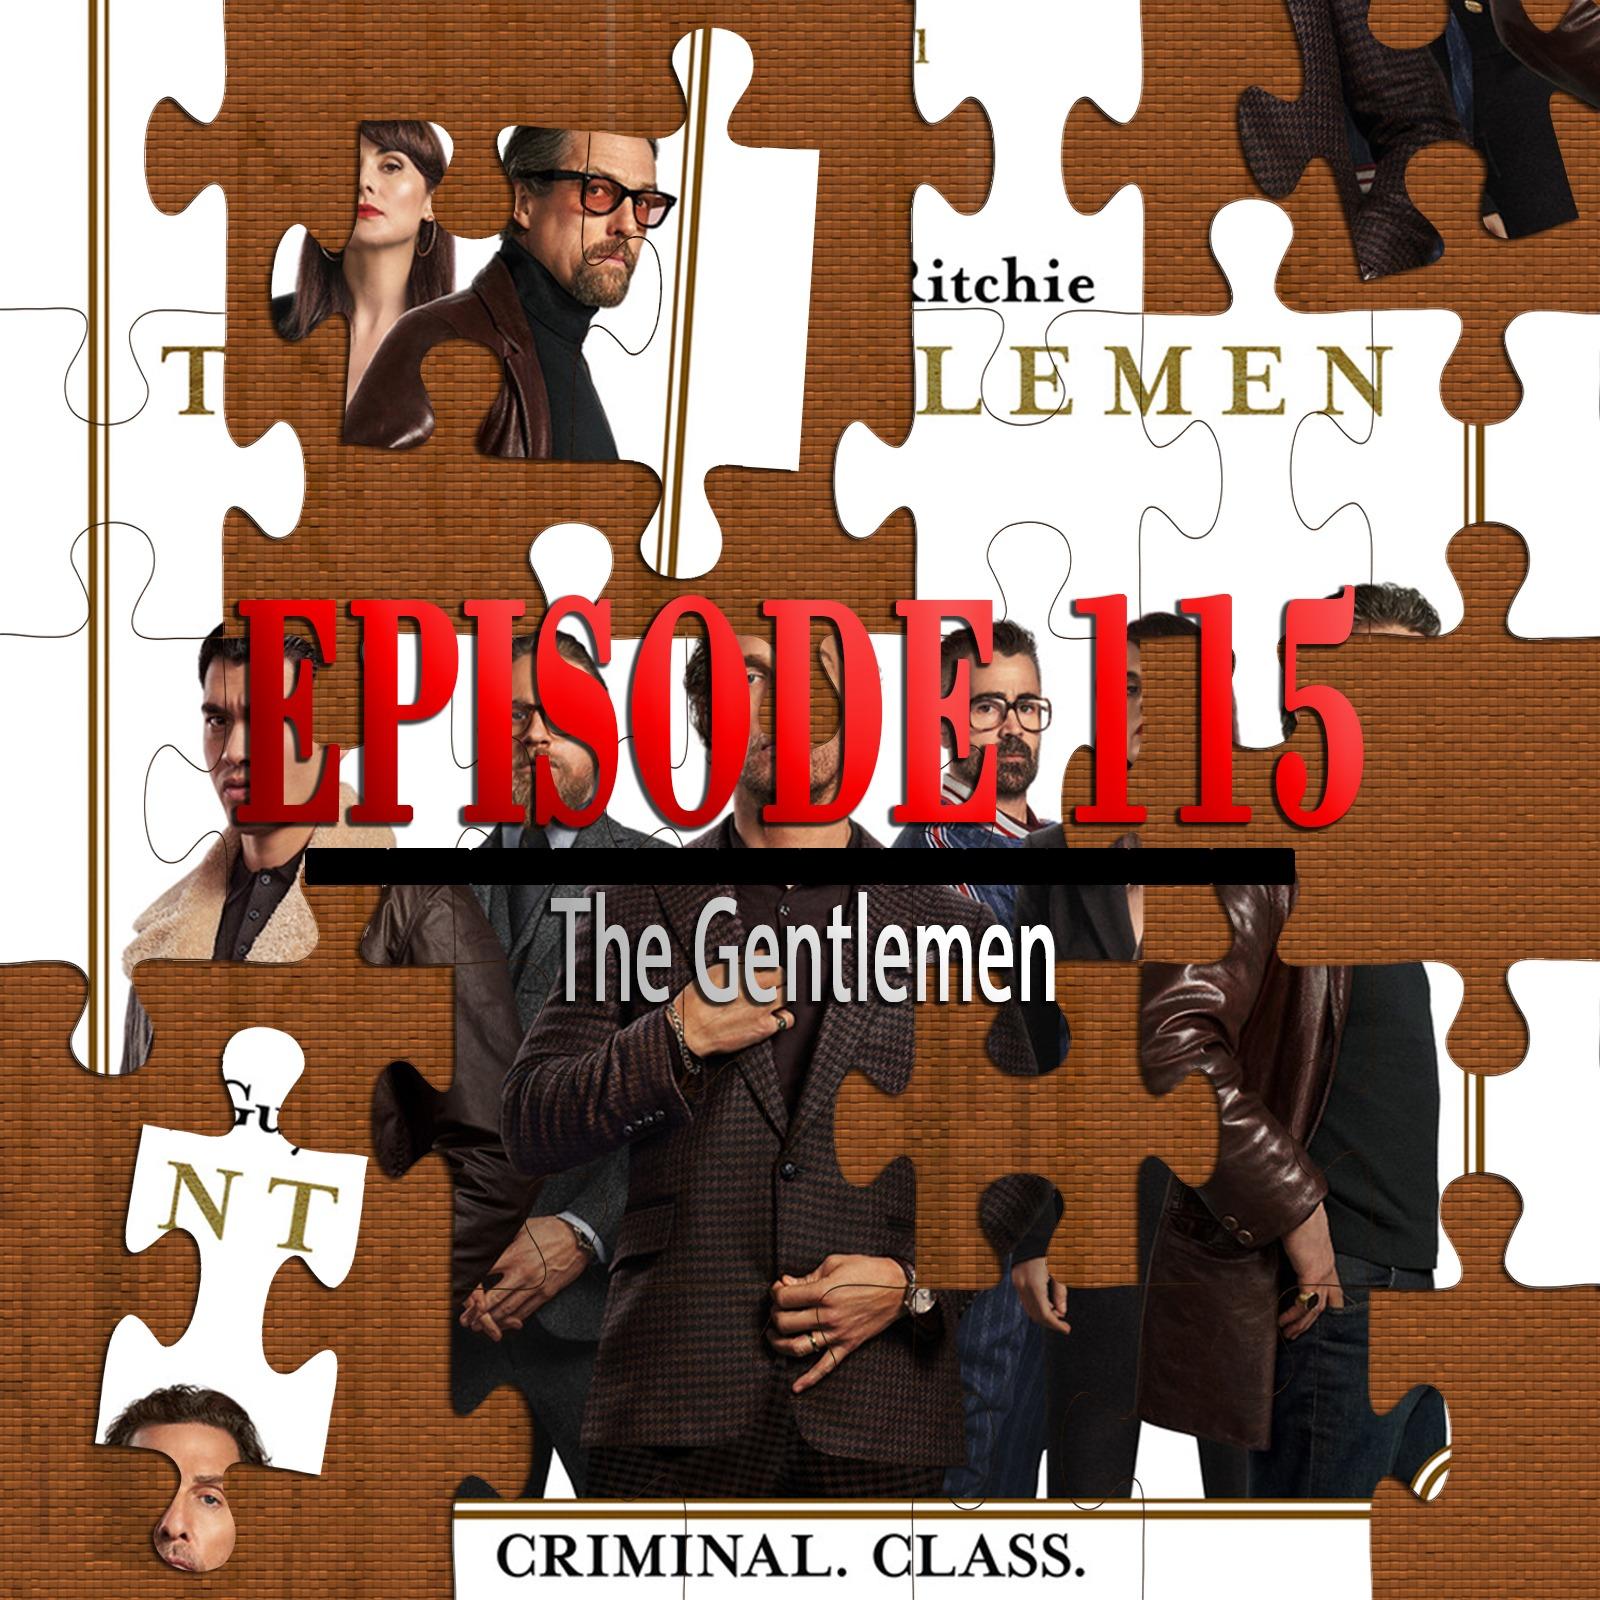 The Gentlemen (Featuring Chad Clinton Freeman)